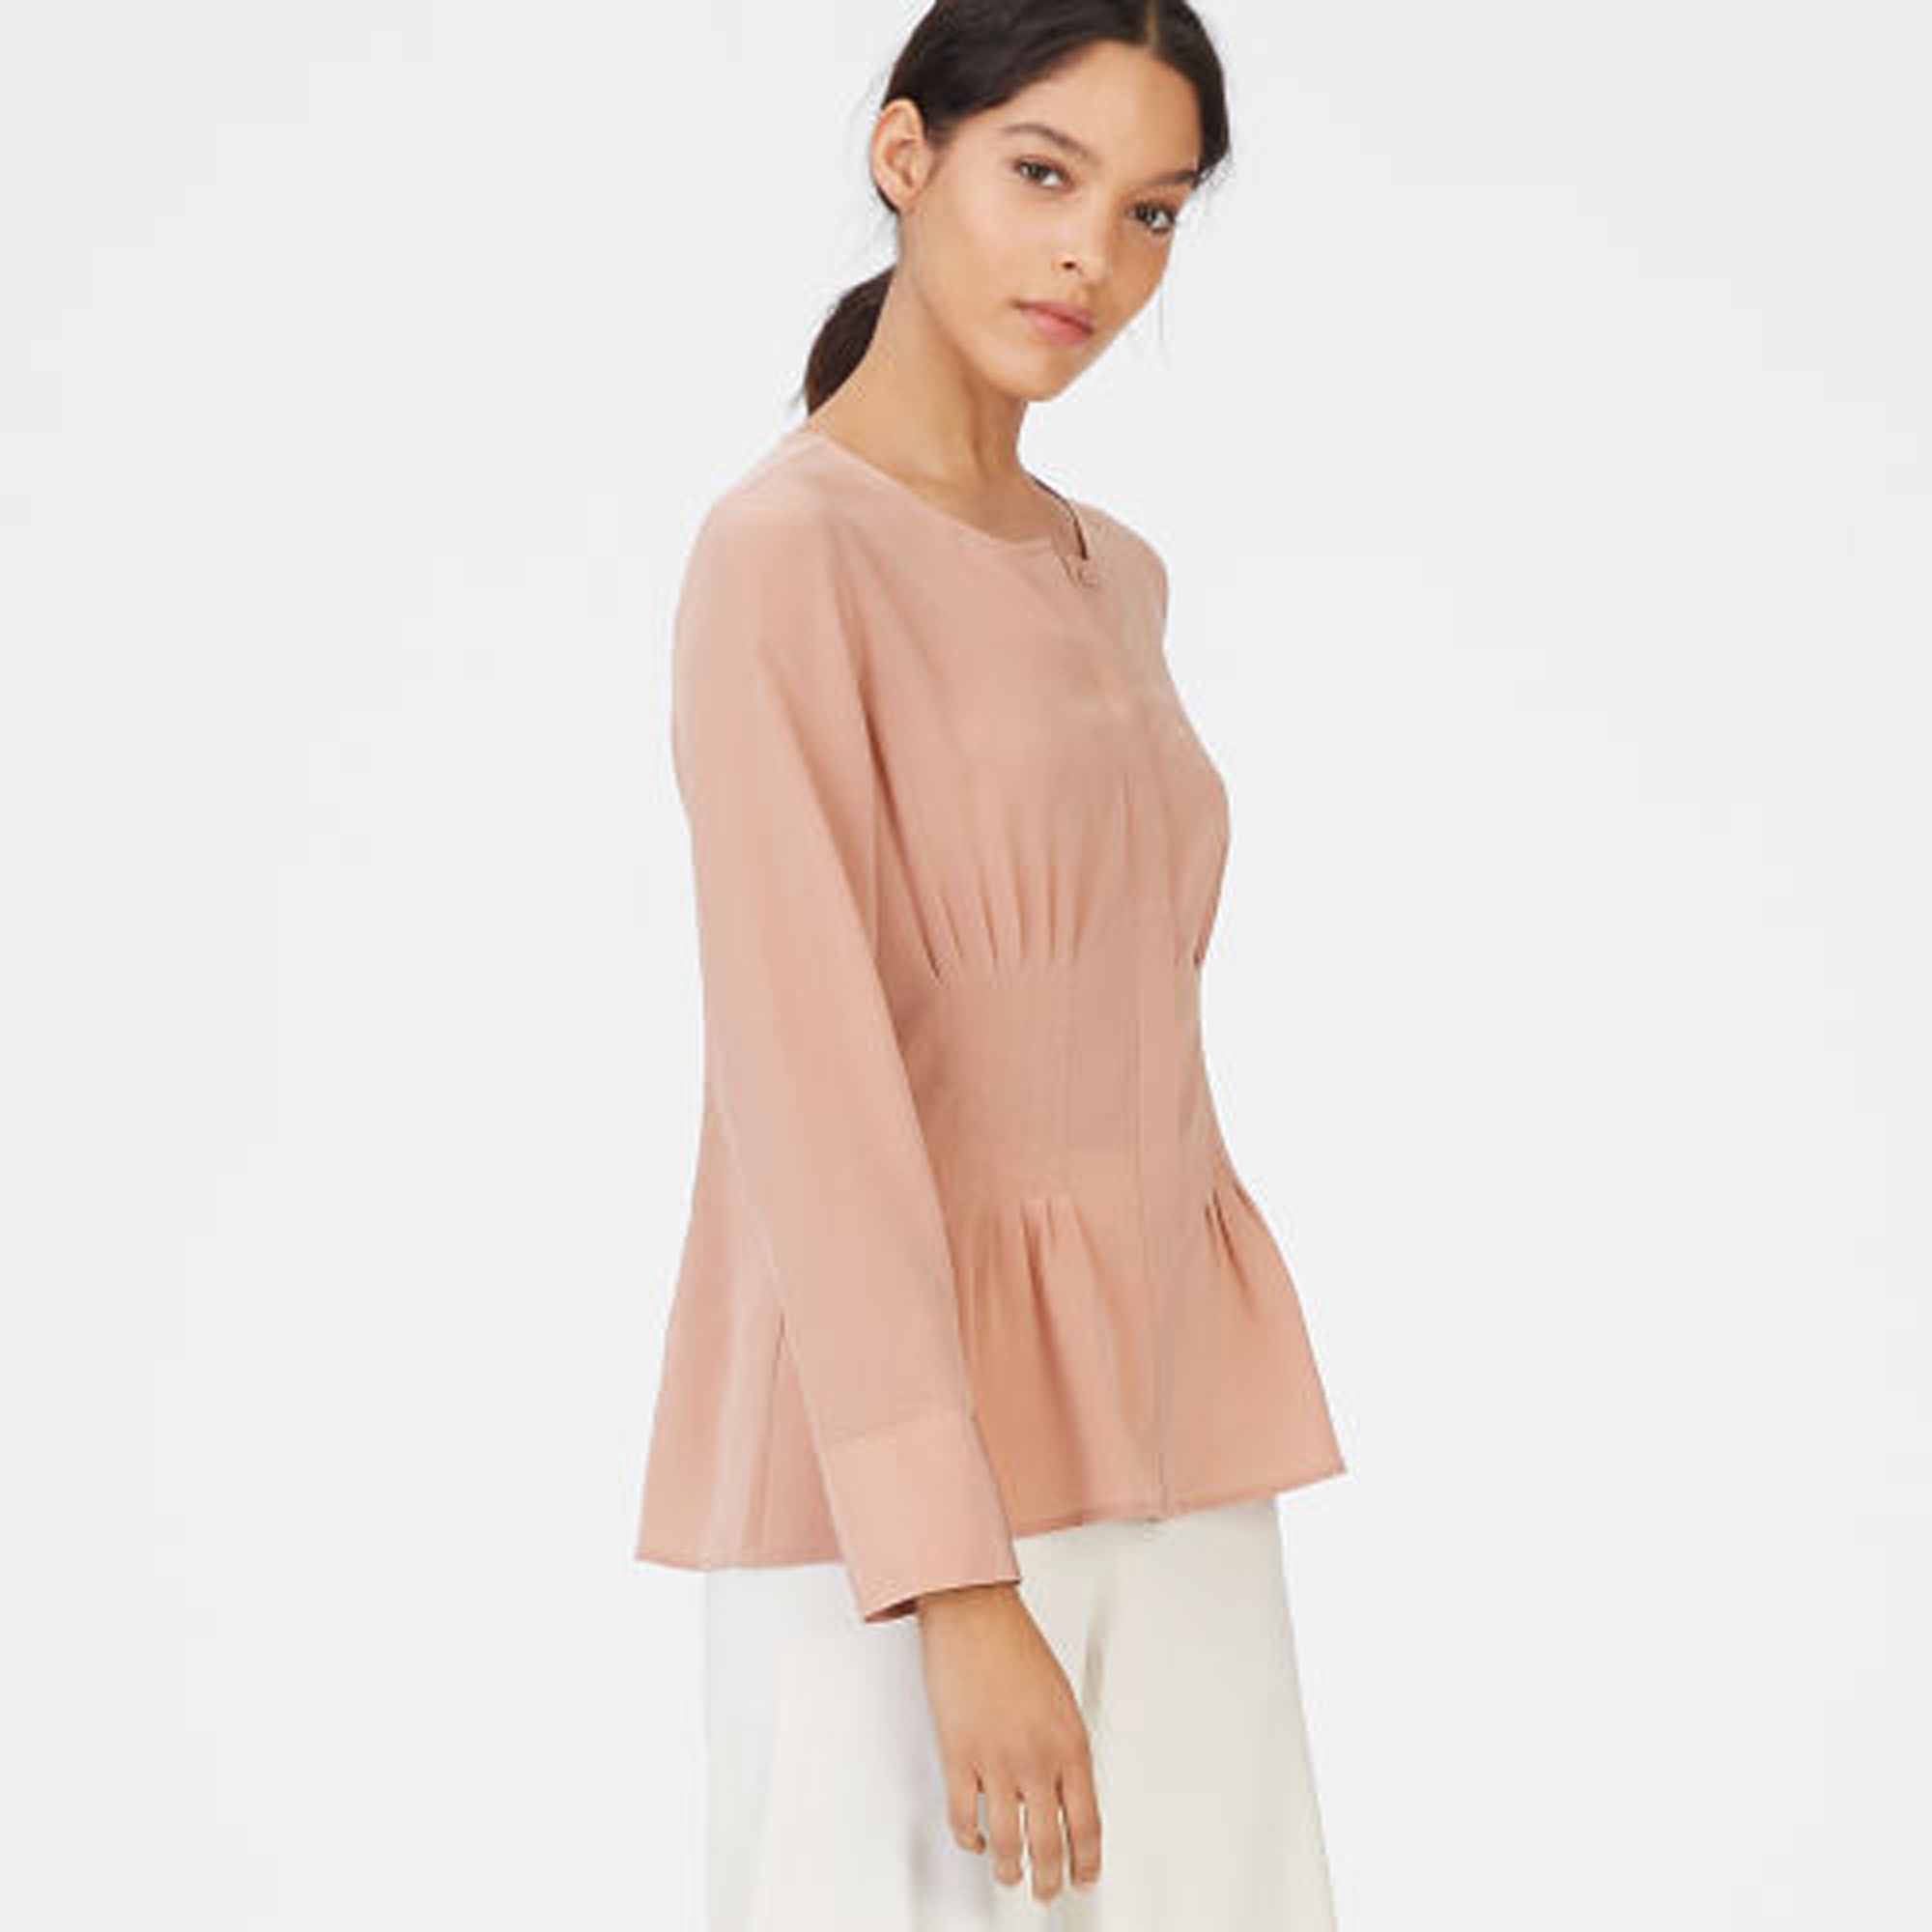 Mabetta Silk Shirt   HK$1,990